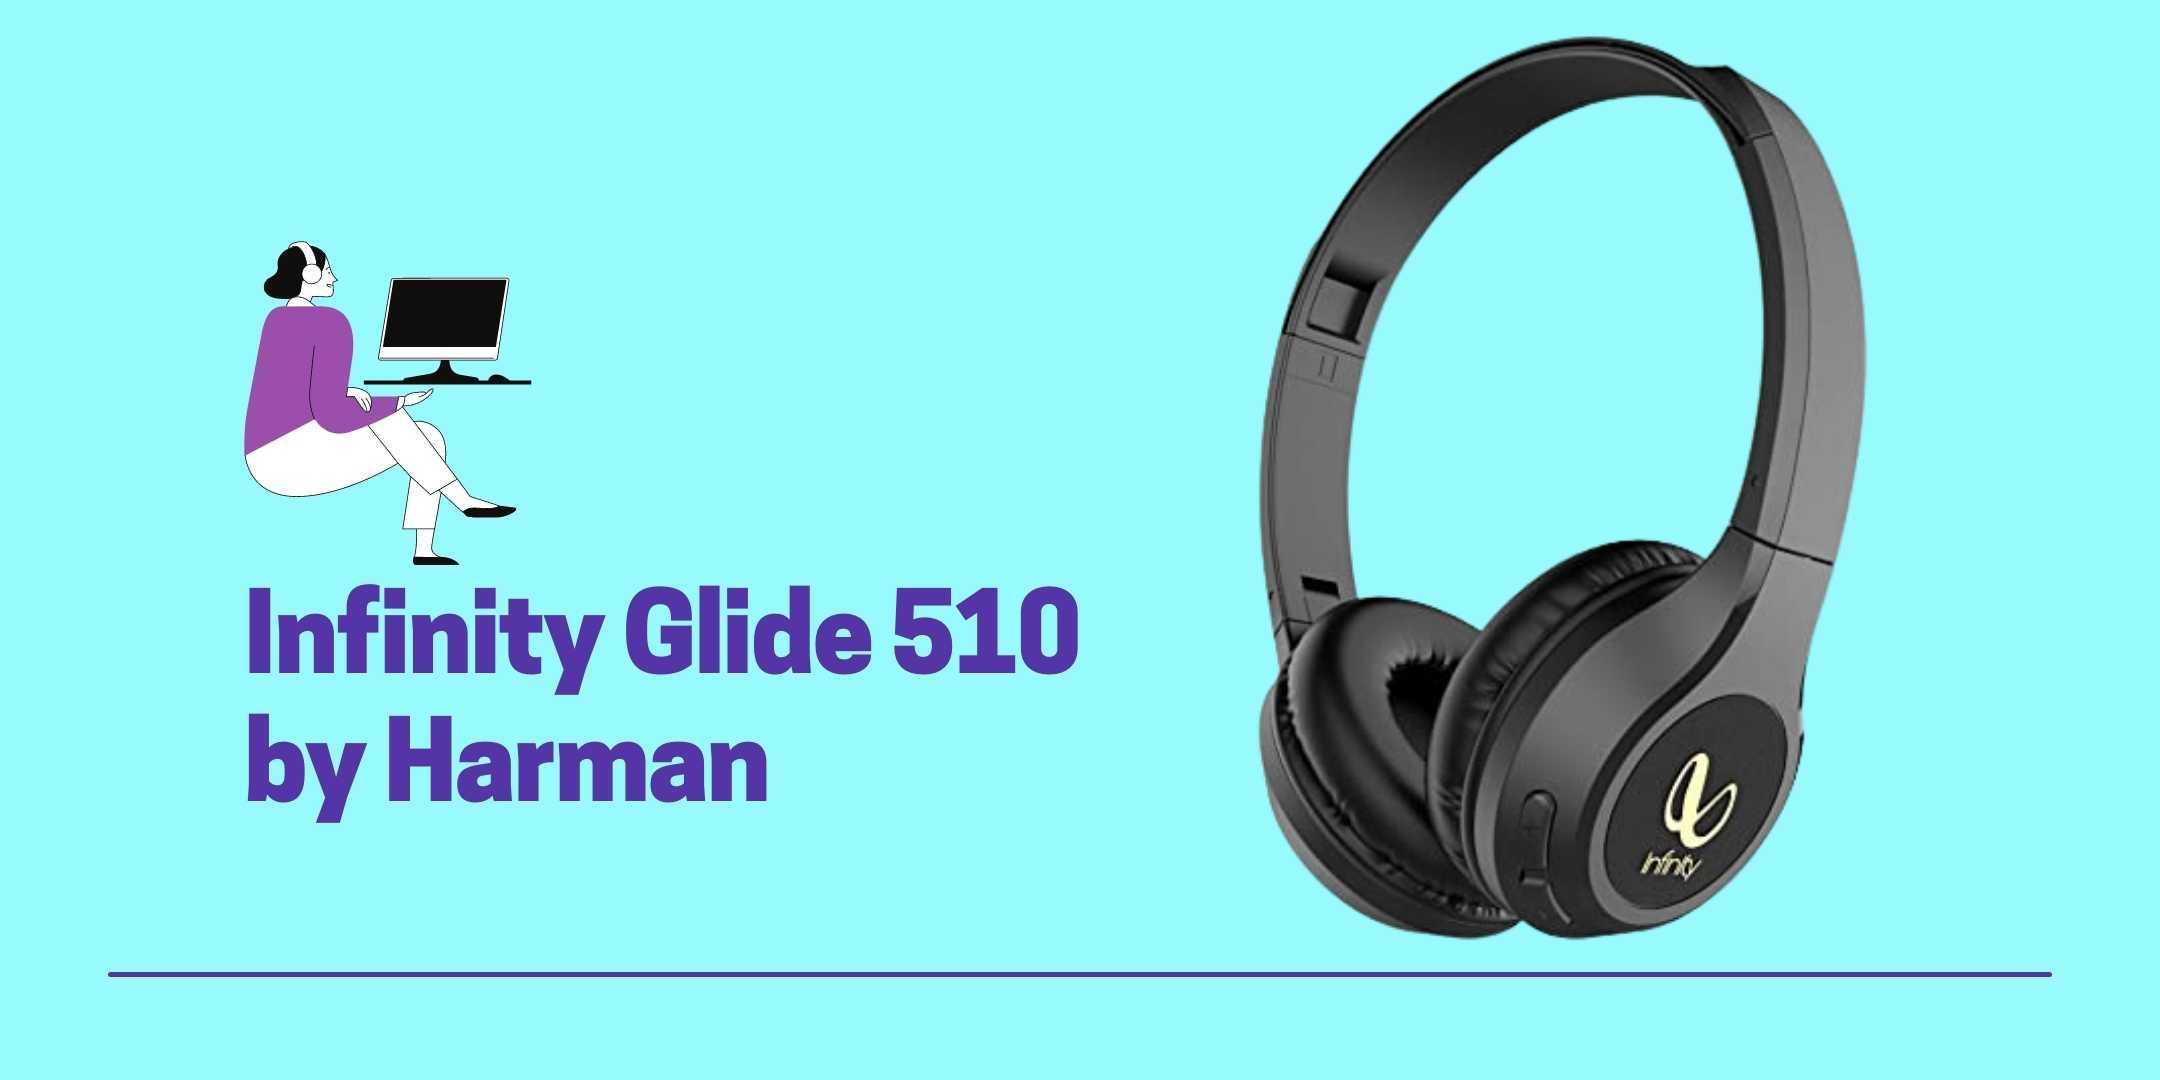 Infinity Glide 510 by Harman